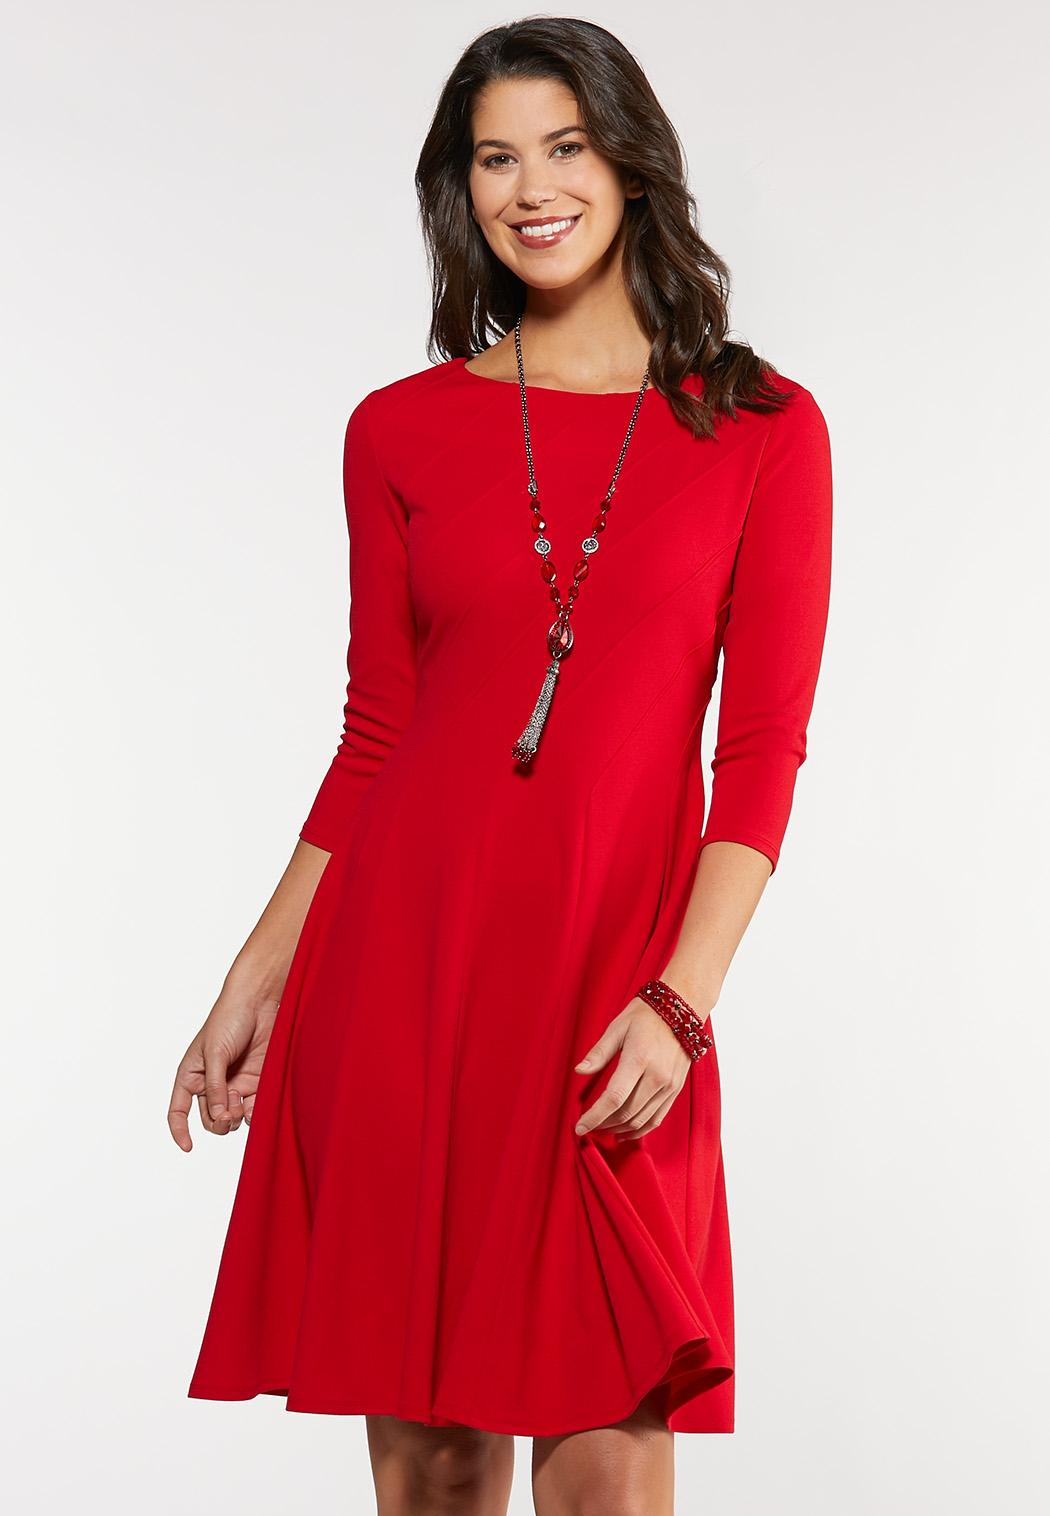 Plus Size Red Seamed Midi Dress Plus Sizes Cato Fashions